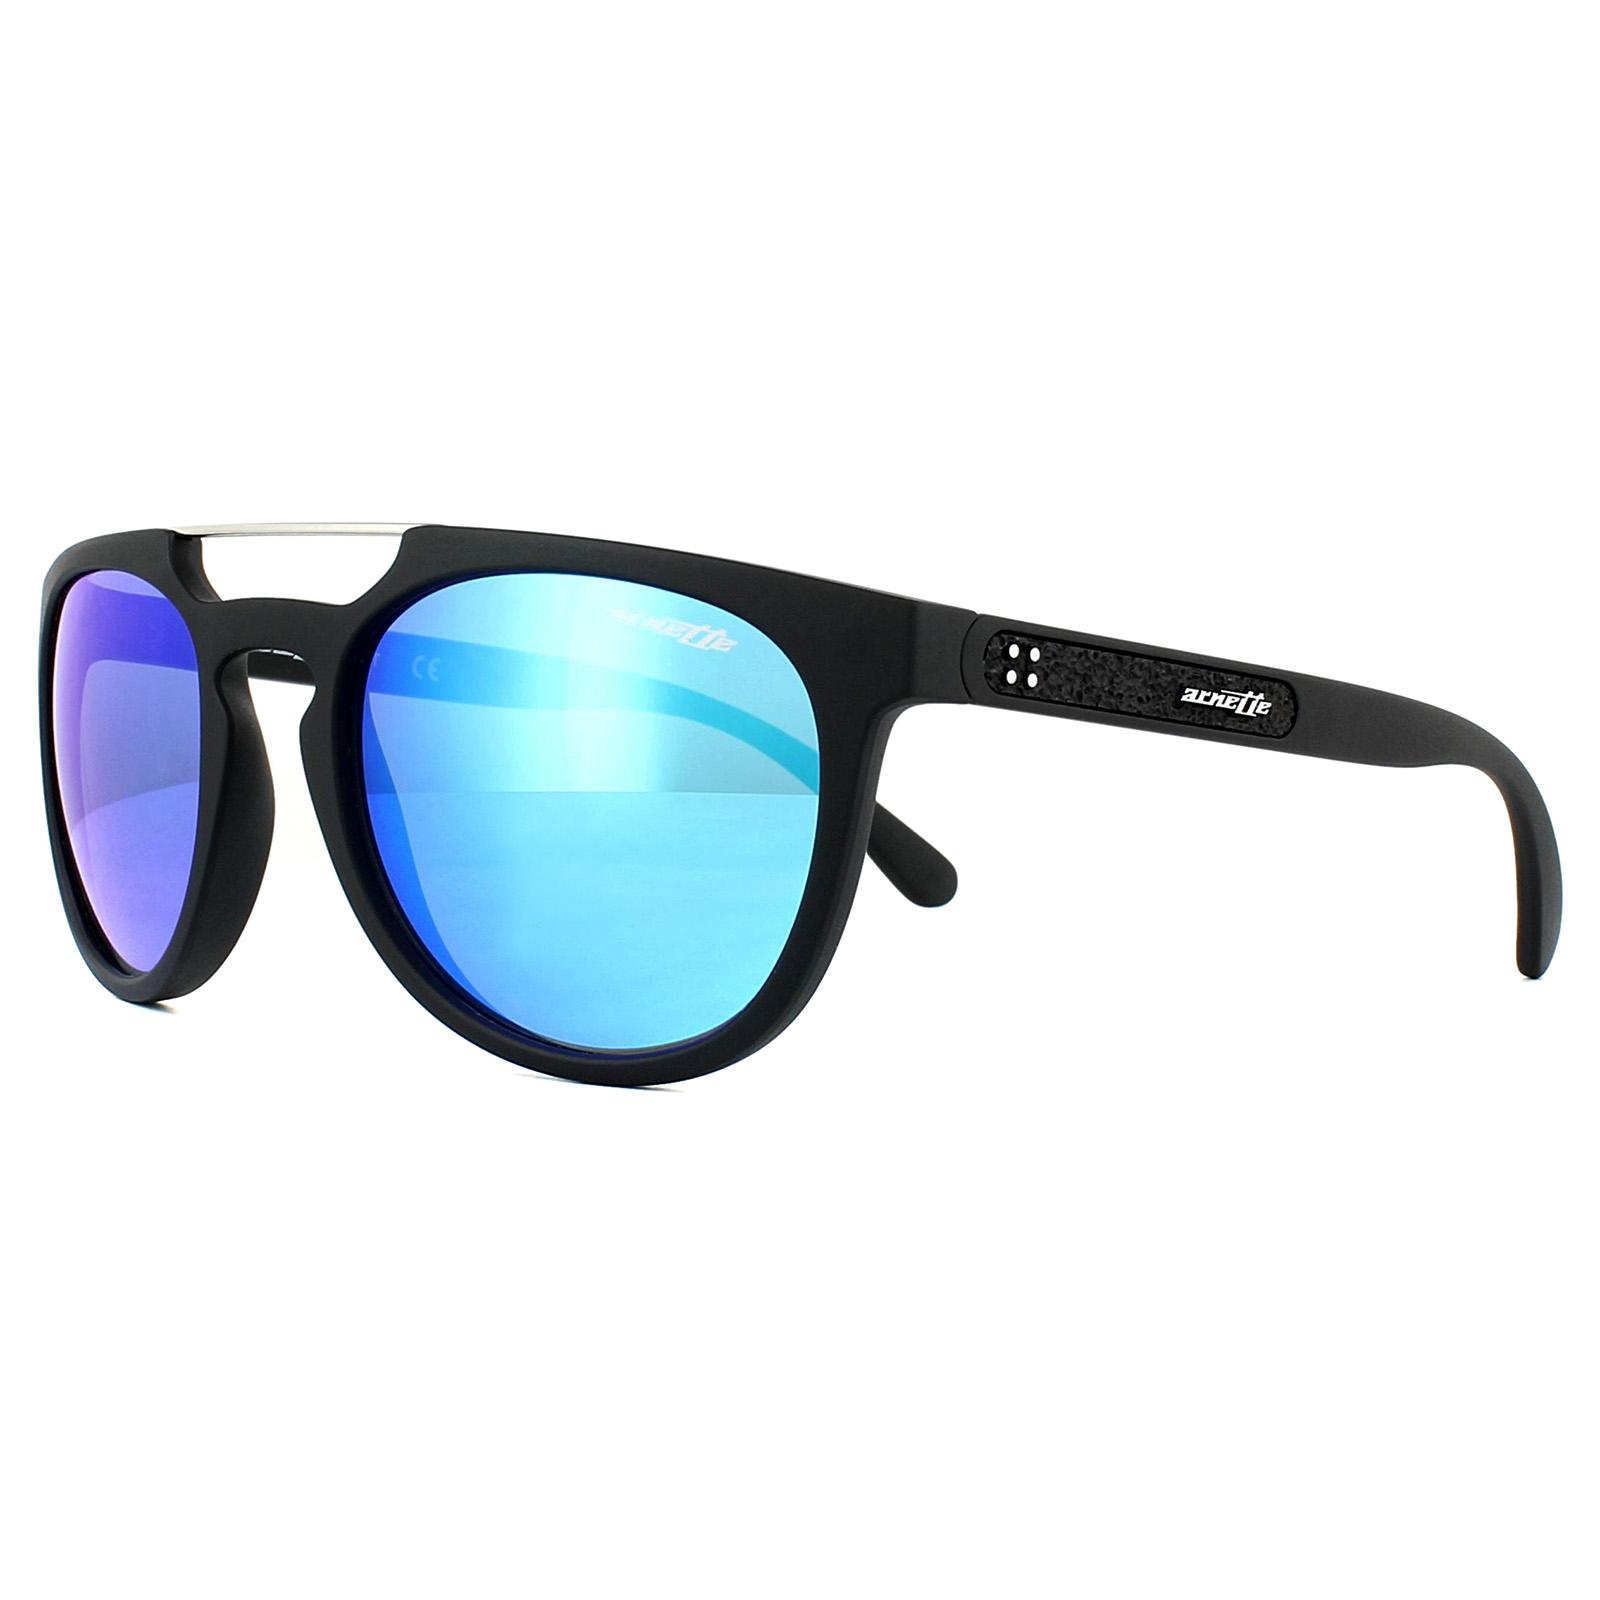 Arnette Woodward 4237 Sunglasses